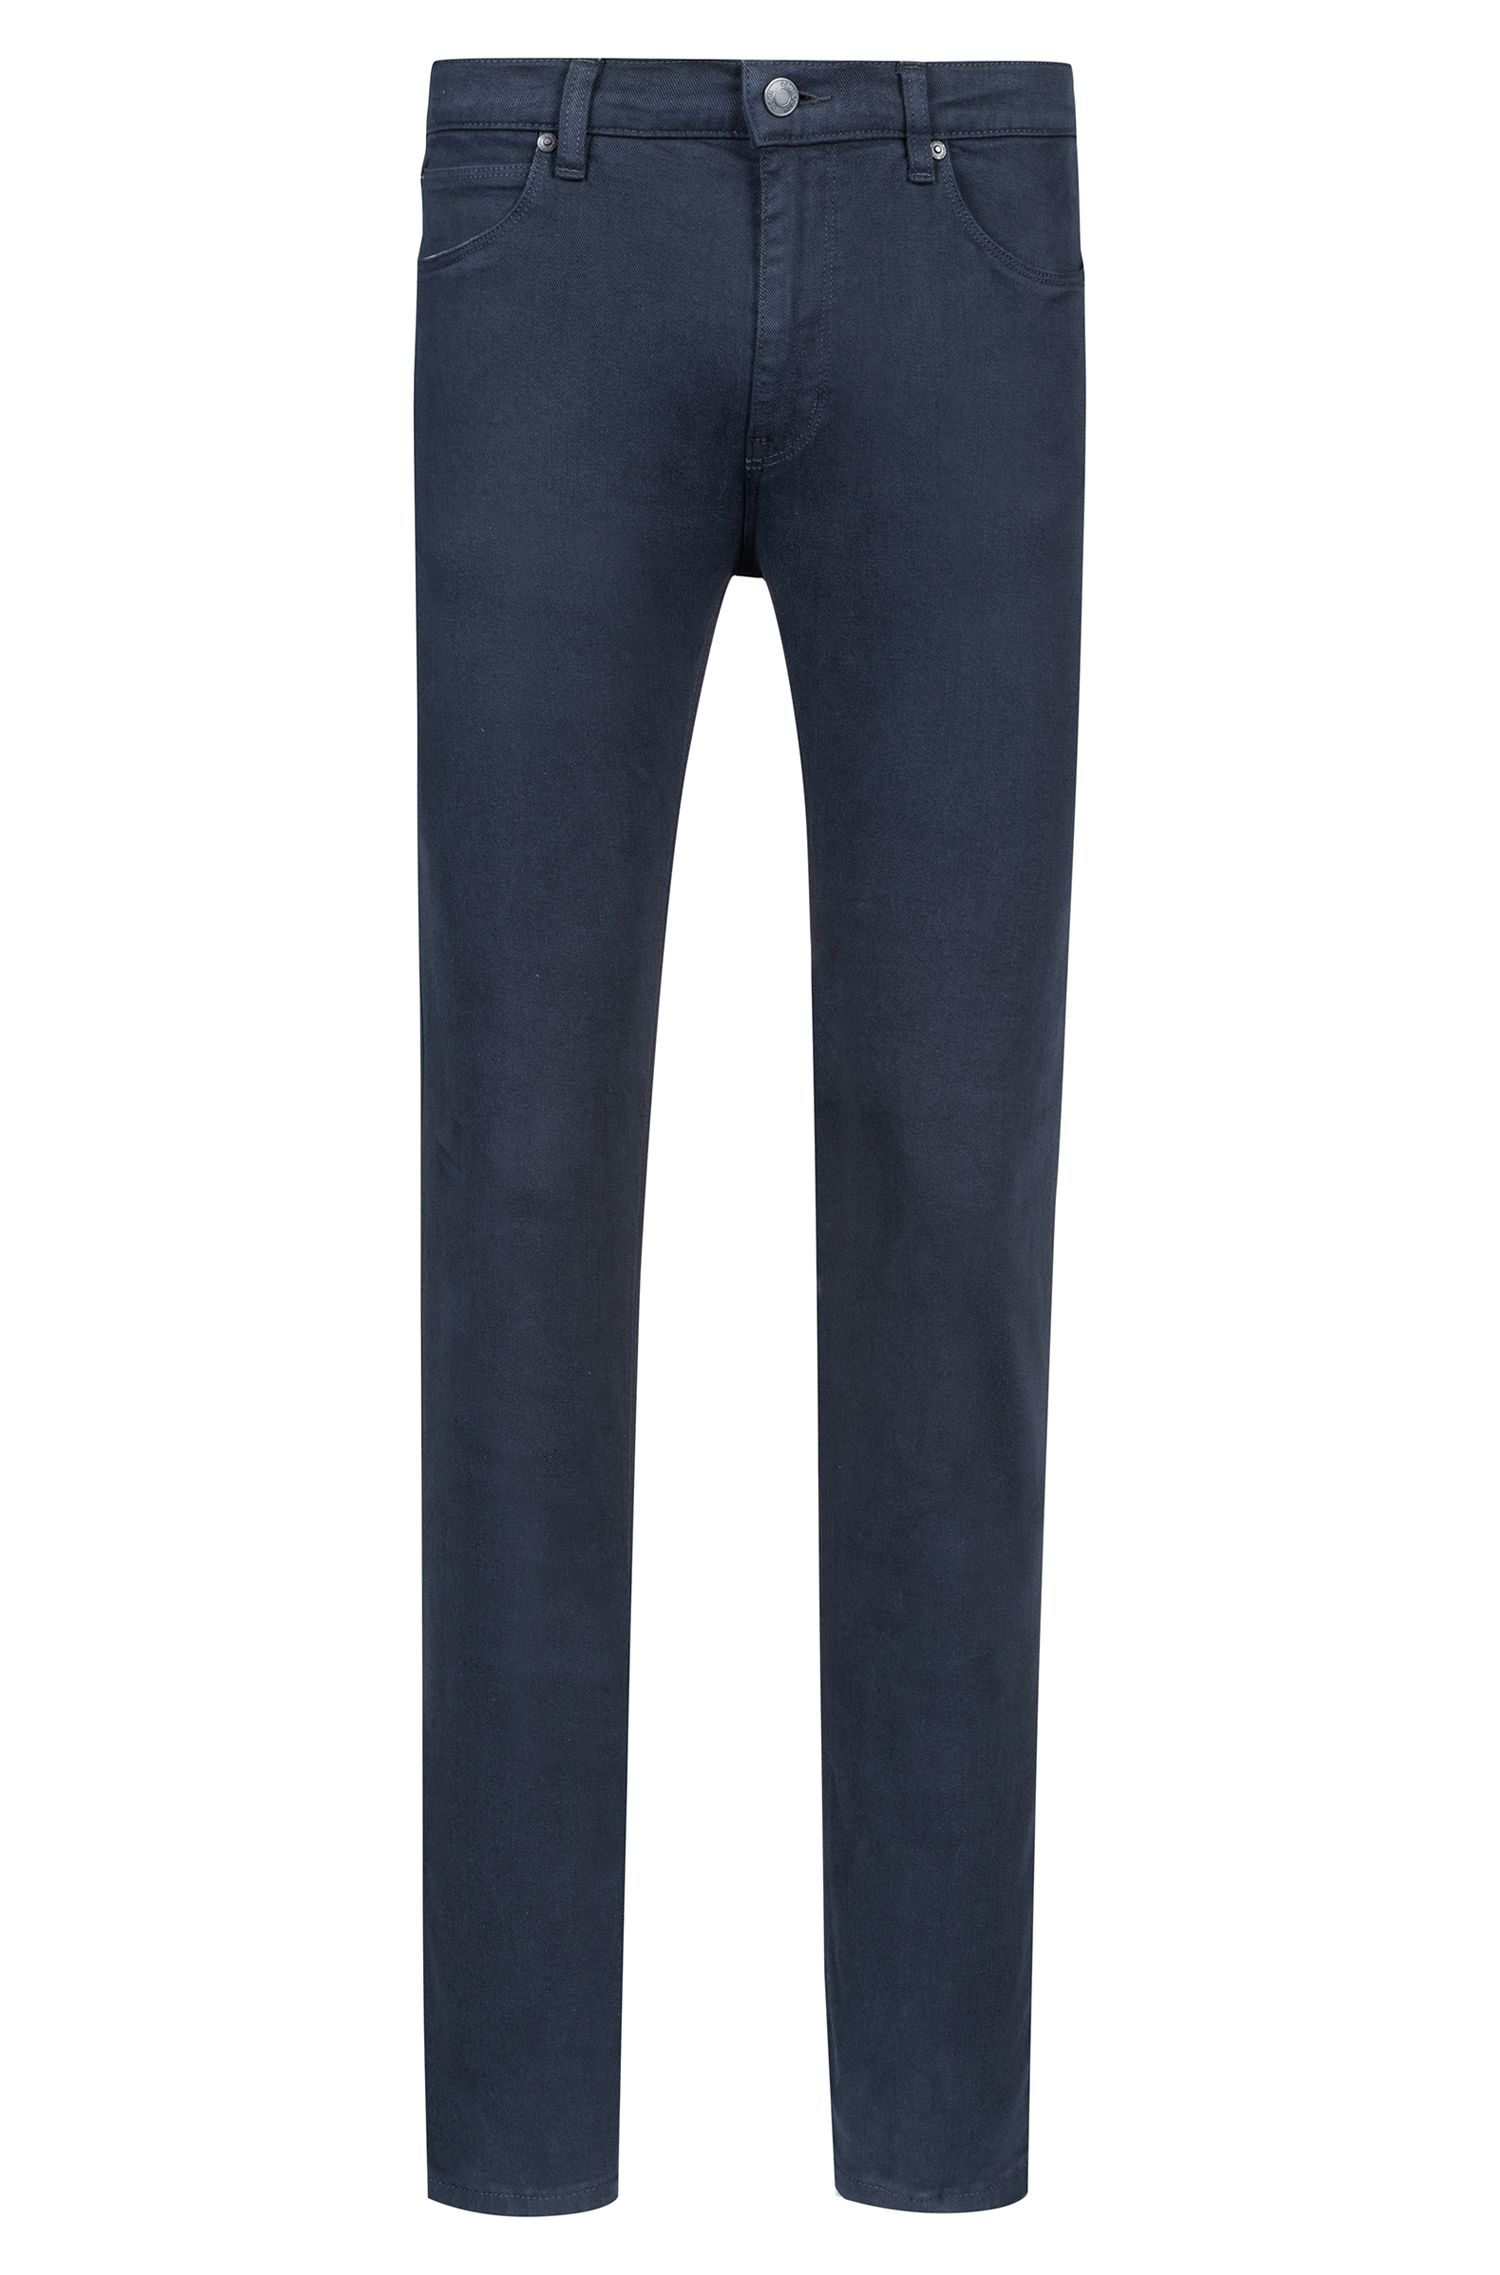 Skinny-fit jeans in dark-blue stretch denim, Dark Blue